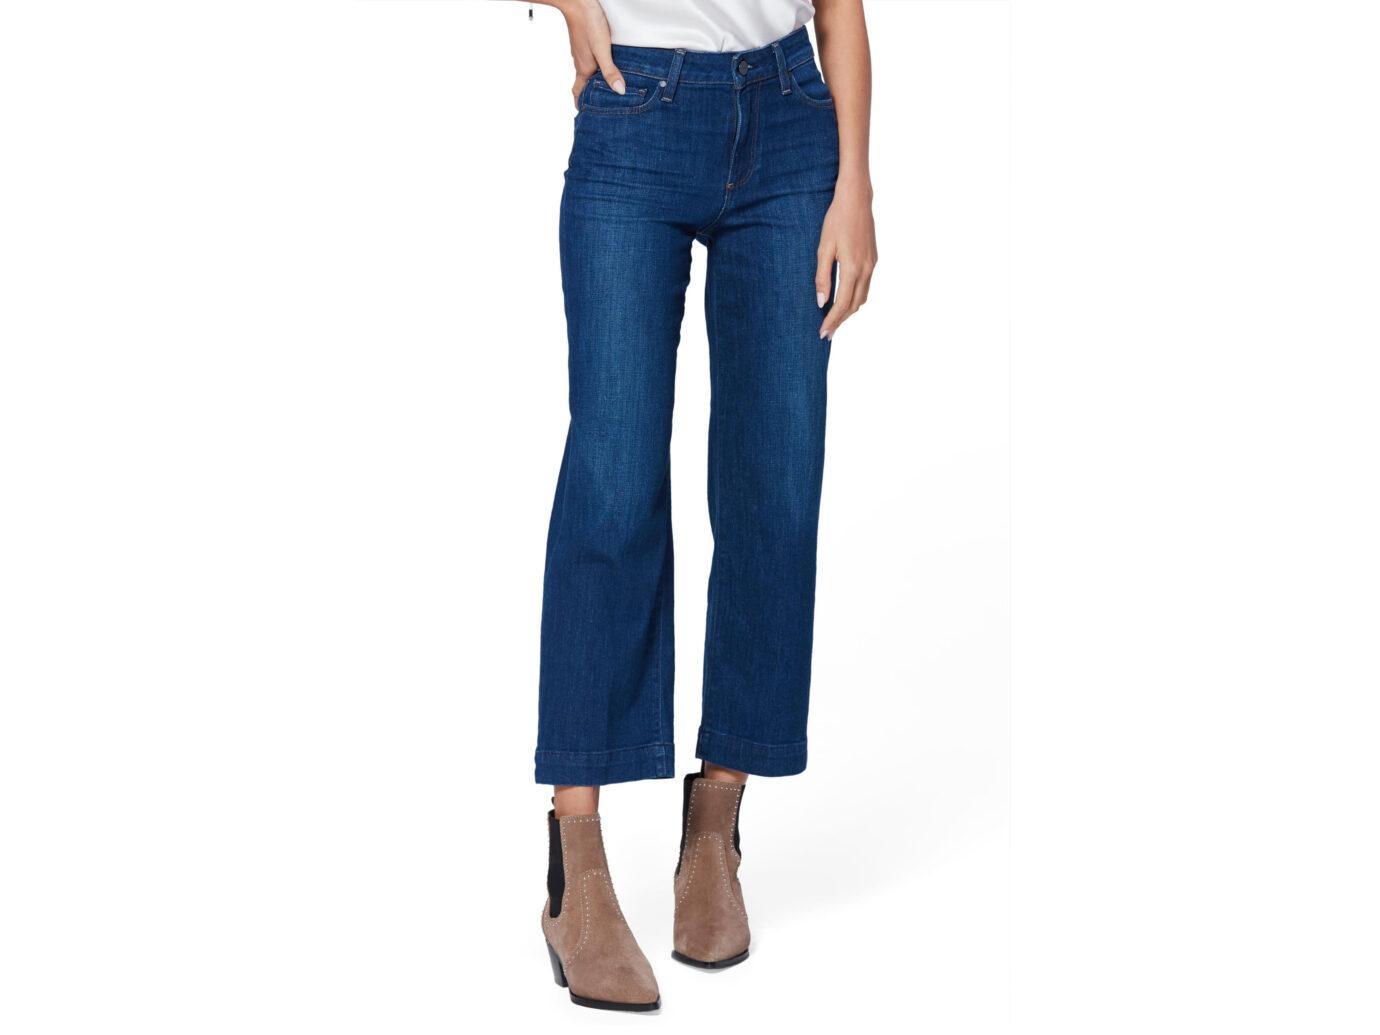 Paige Nellie High Waist Culotte Jeans